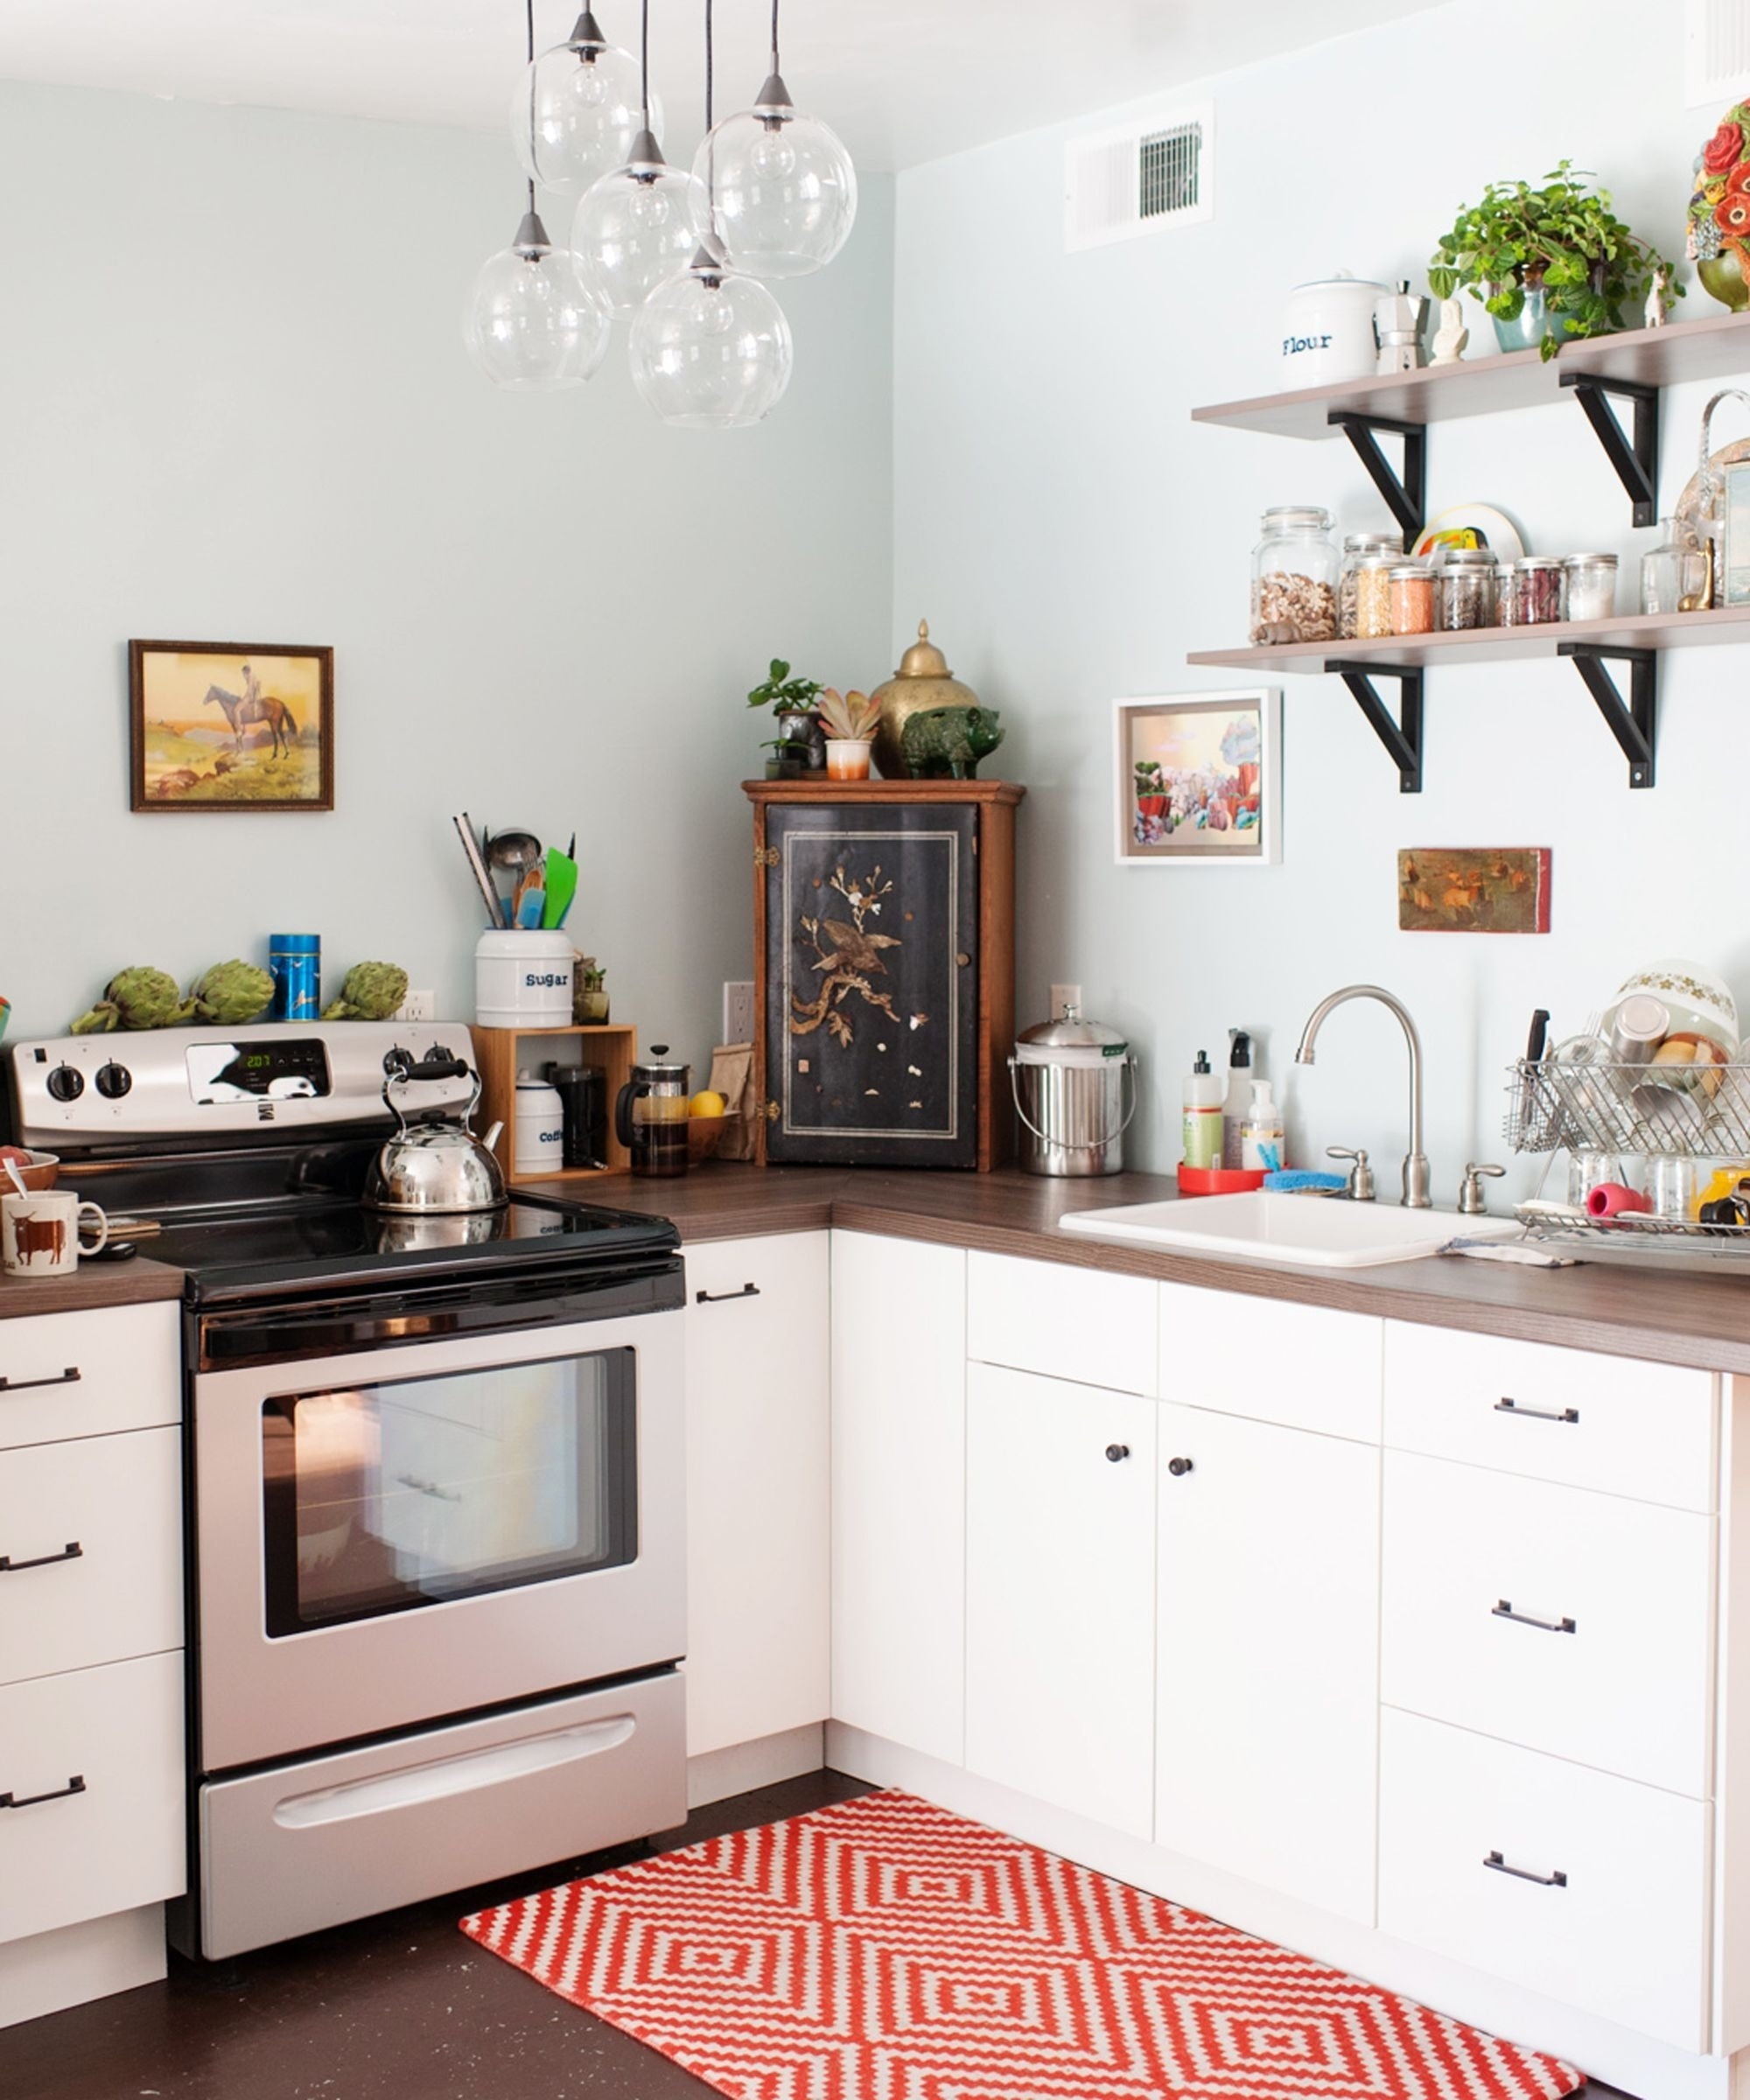 10 Unique Kitchen Lighting Ideas Small Kitchen kitchen lighting ideas for small kitchen kutskokitchen